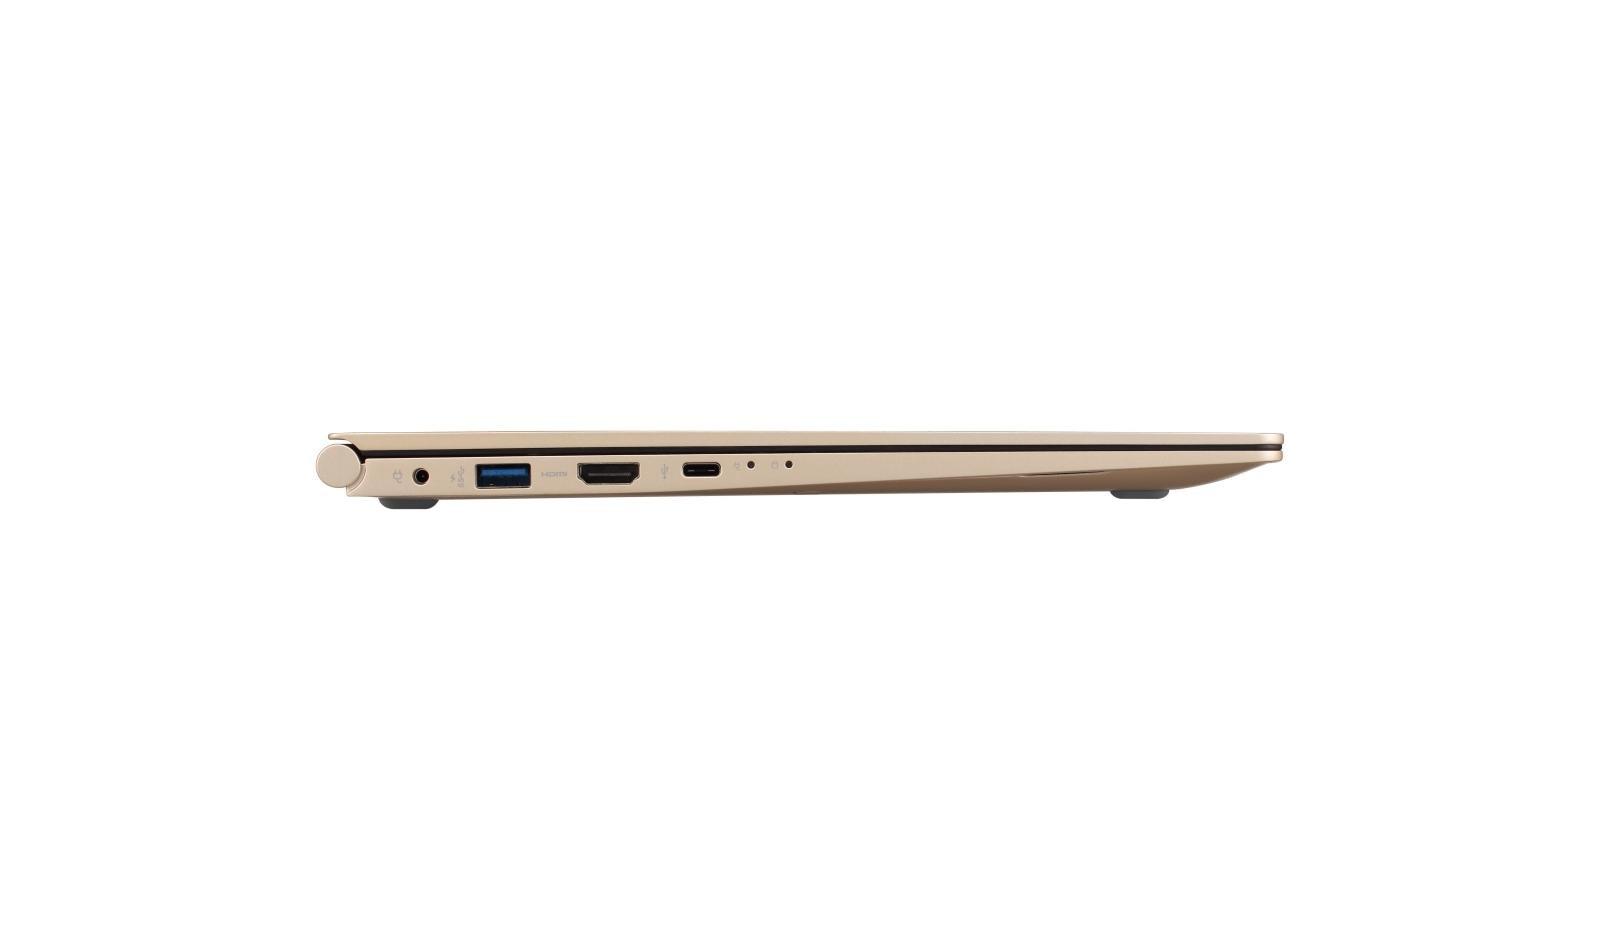 Lg 15z960 Aaa75u1 Gram 15 Core I7 Processor Ultra Slim Laptop Dsl Phone Jack Wiring Diagram 2016 Usa